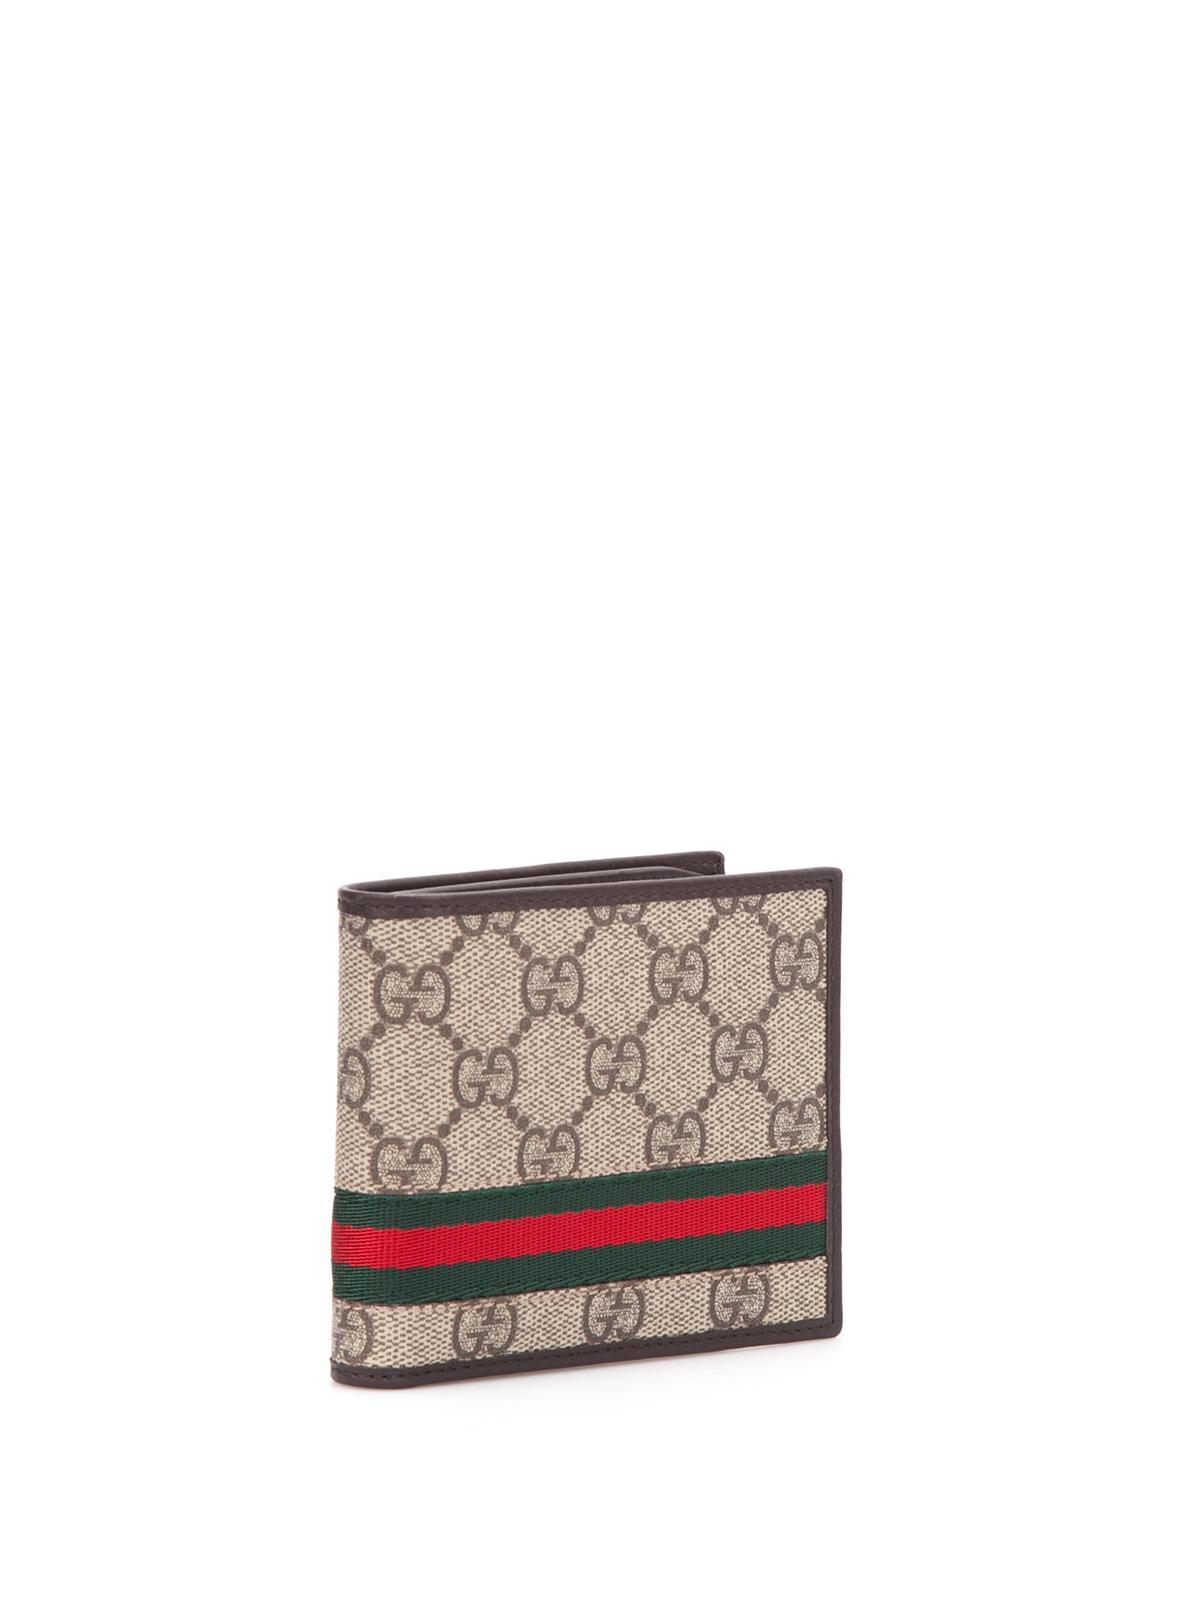 1635a3200d5c Gucci - GG supreme canvas bi-fold wallet - wallets & purses - 365491 ...